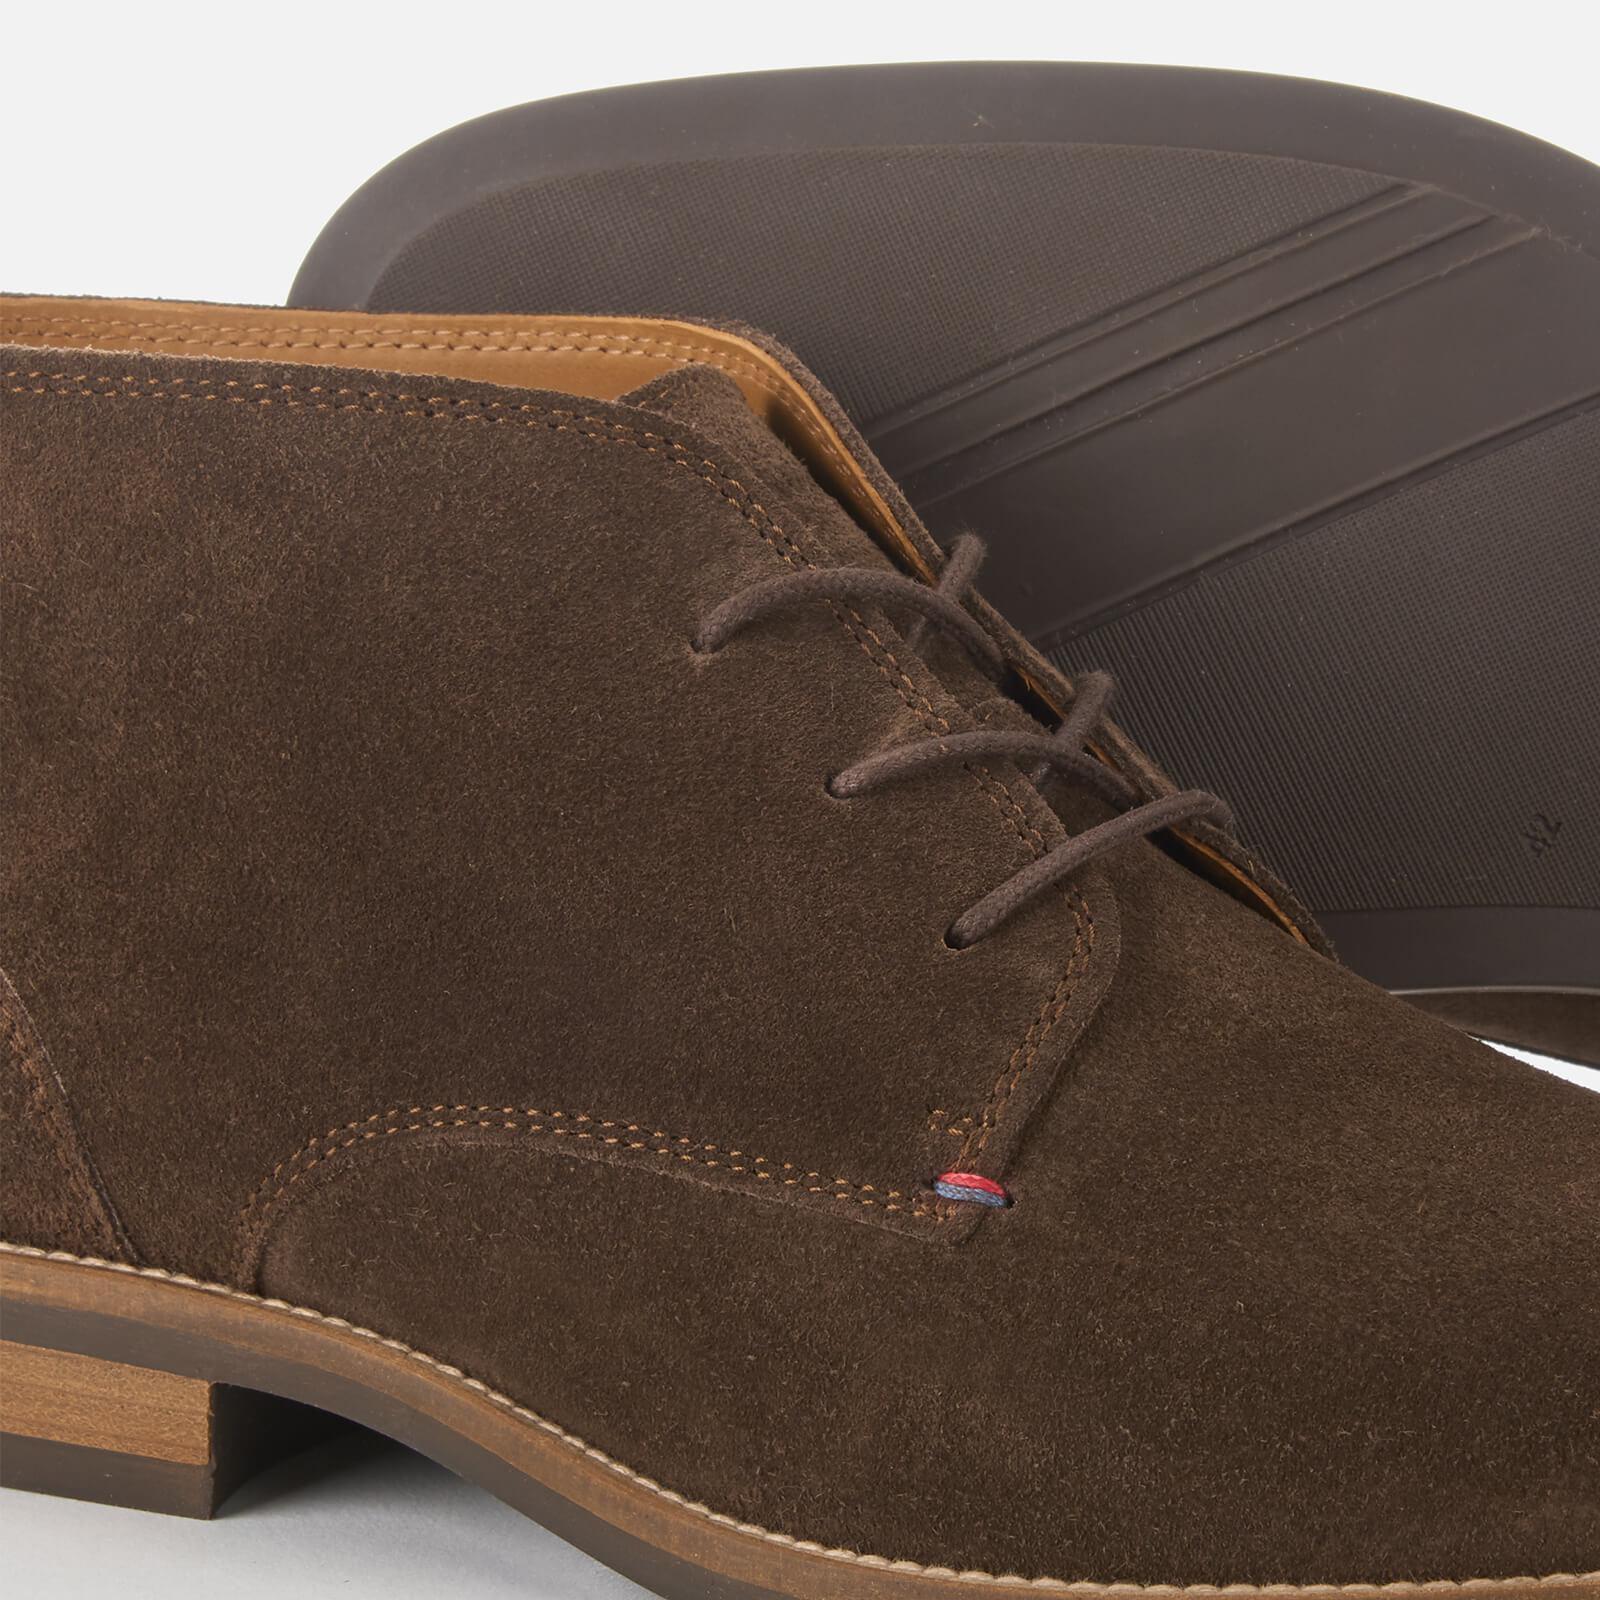 80f83e9345e0e6 Tommy Hilfiger - Brown Essential Suede Desert Boots for Men - Lyst. View  fullscreen